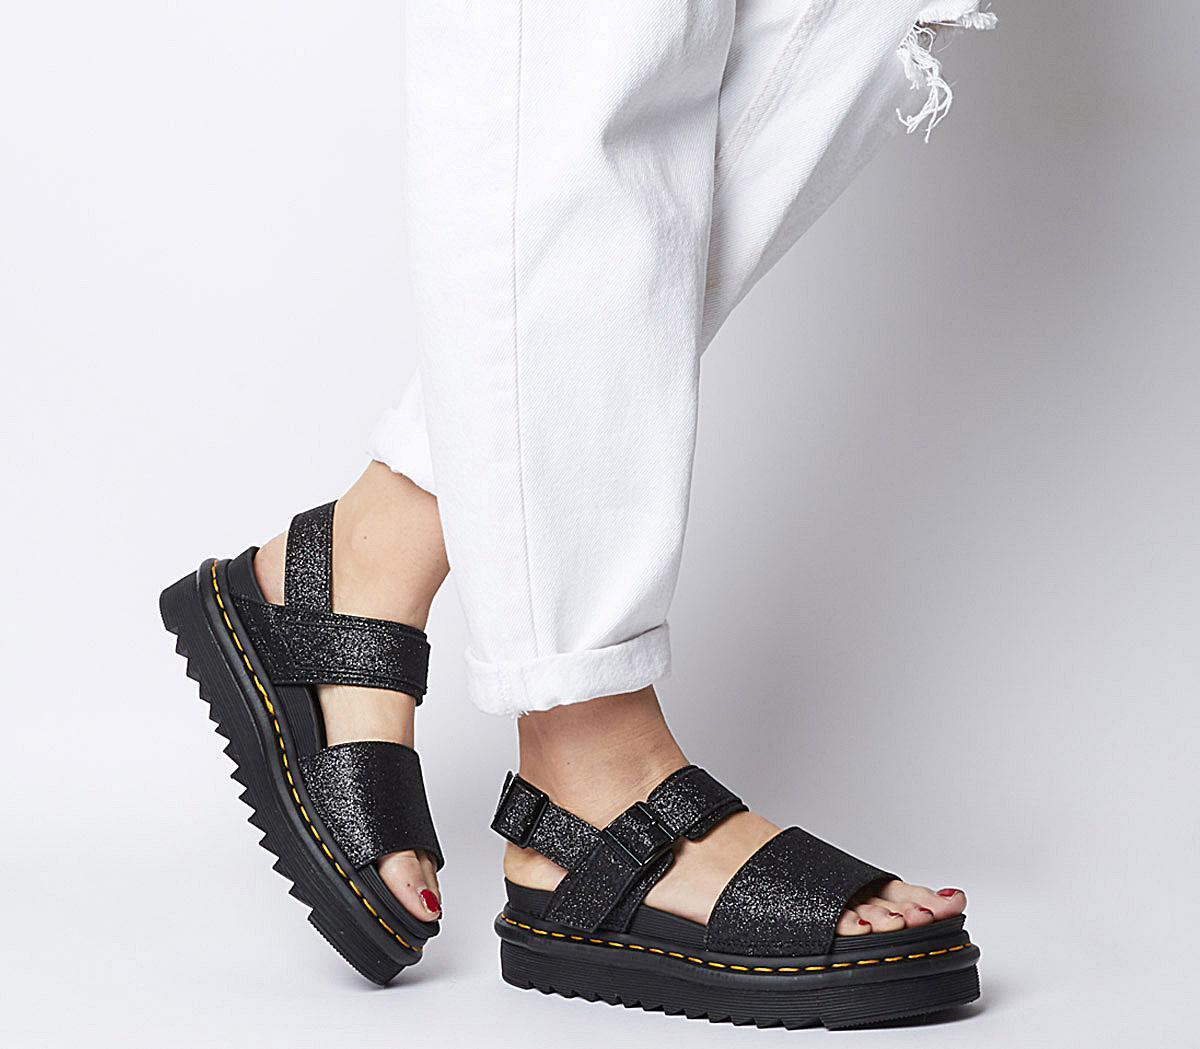 Dr. Martens Voss Sandals Black Fine